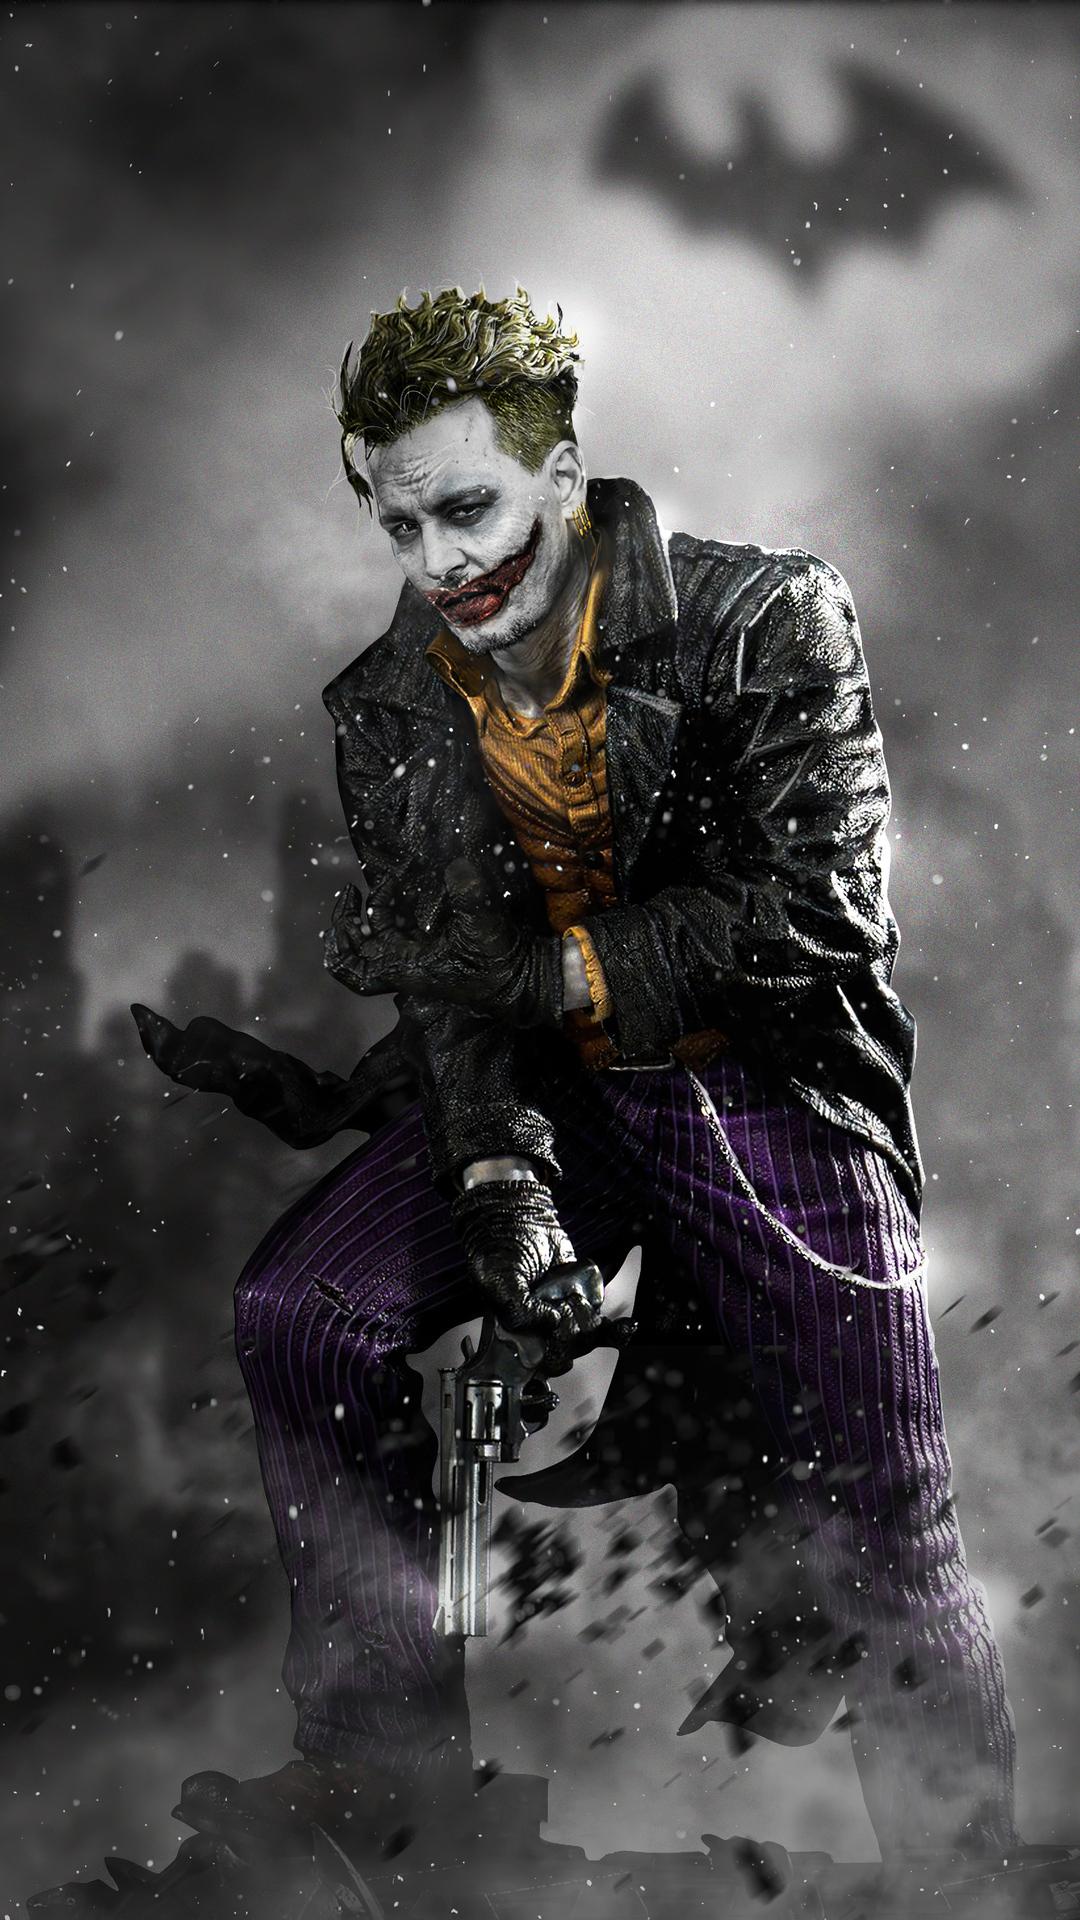 1080x1920 Joker Johnny Depp Iphone 7,6s,6 Plus, Pixel xl ...